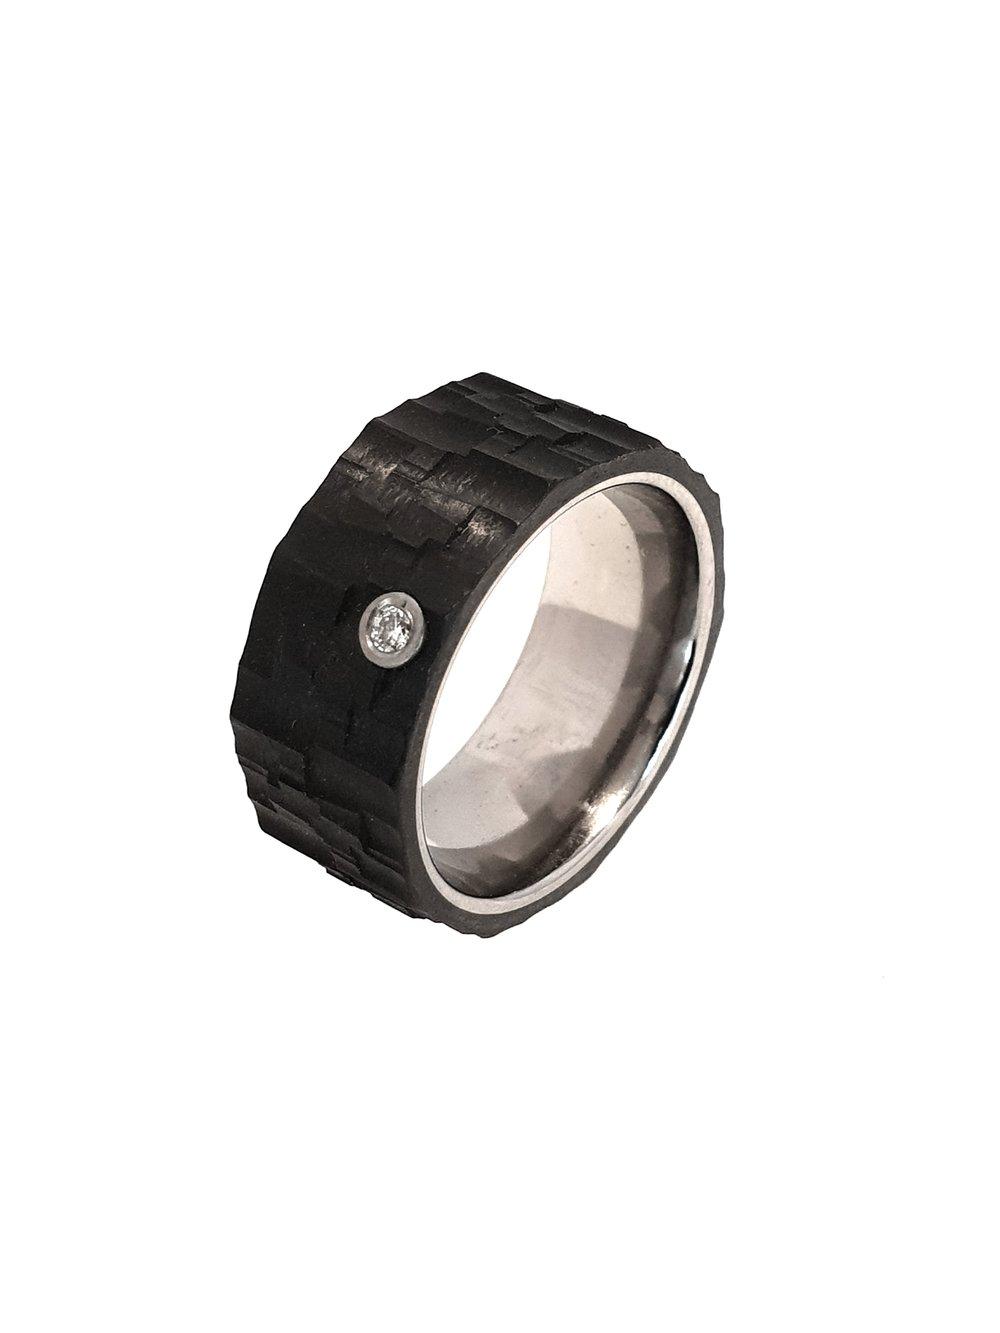 Carbon Fibre & Titanium Ring, .03ct Diamond, 9mm    Titan Factory (Model: 57054/001/003/2050)   Current Stock Size: N 1/2  Stock Code: E9803  £325